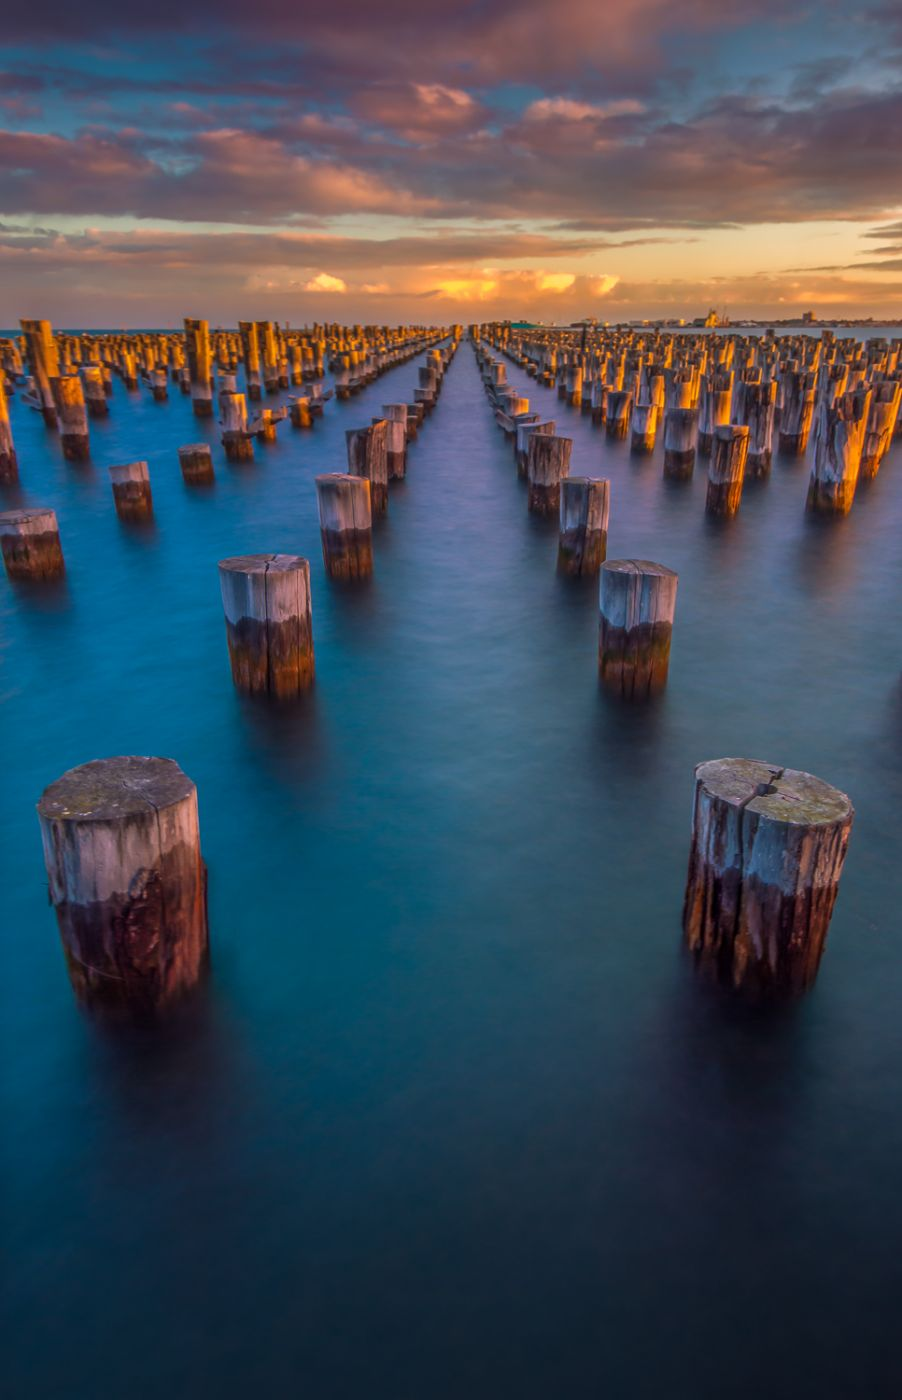 Princess Pier, Australia